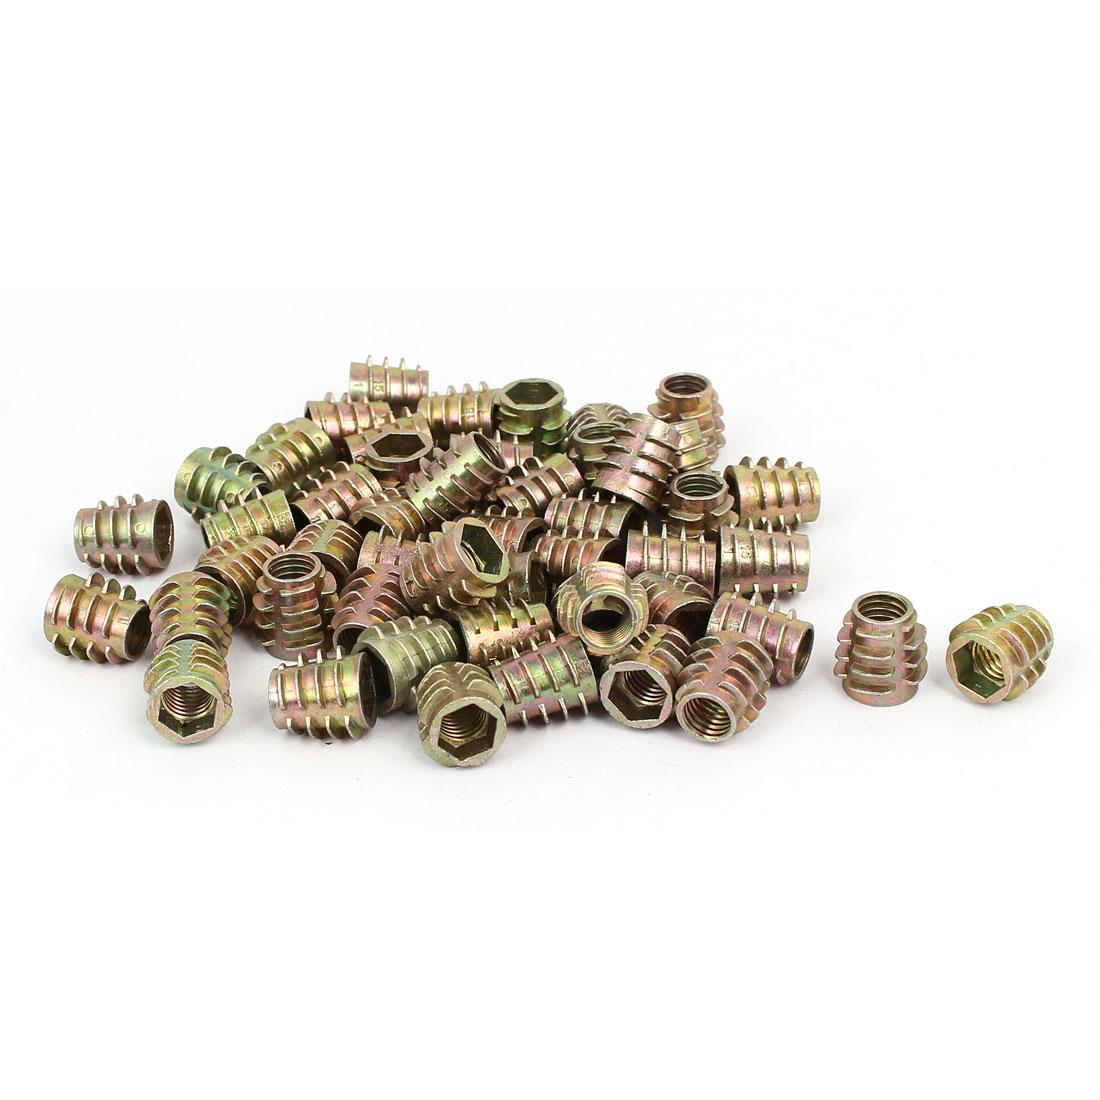 Wood Furniture Zinc Alloy Hex Socket Insert Screws E-Nuts M8x15mm 50pcs